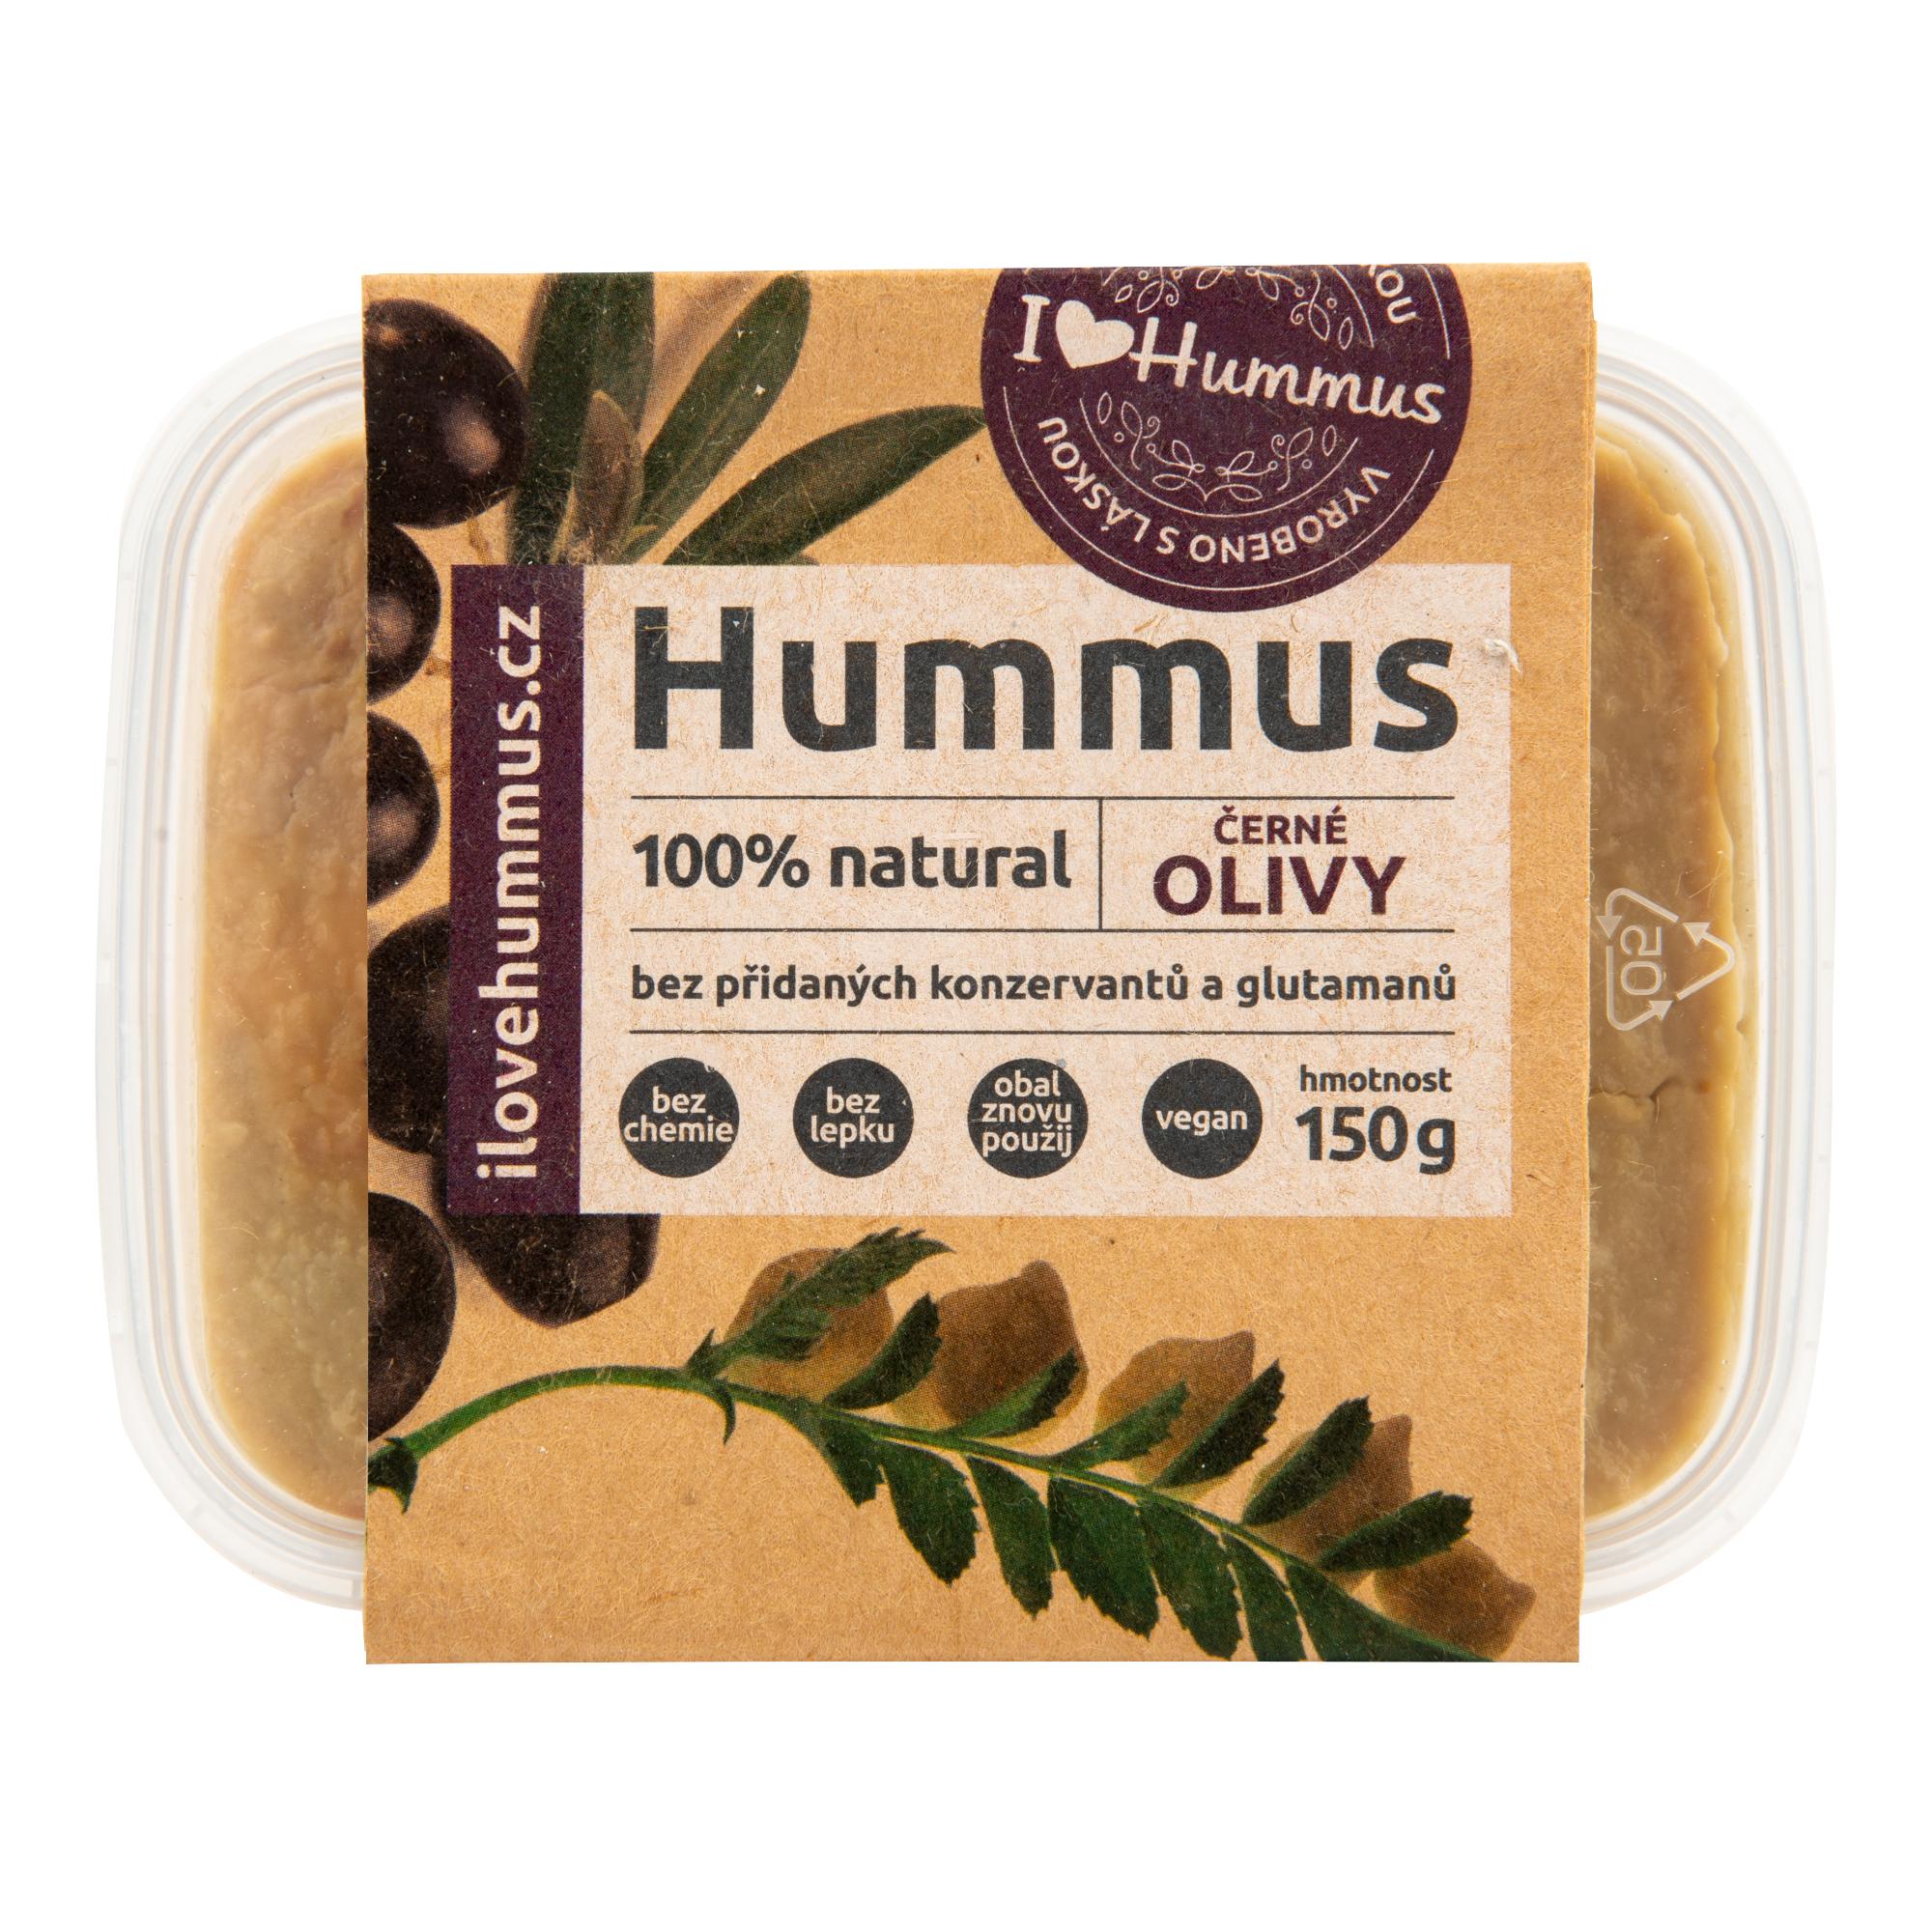 Hummus černé olivy 150g